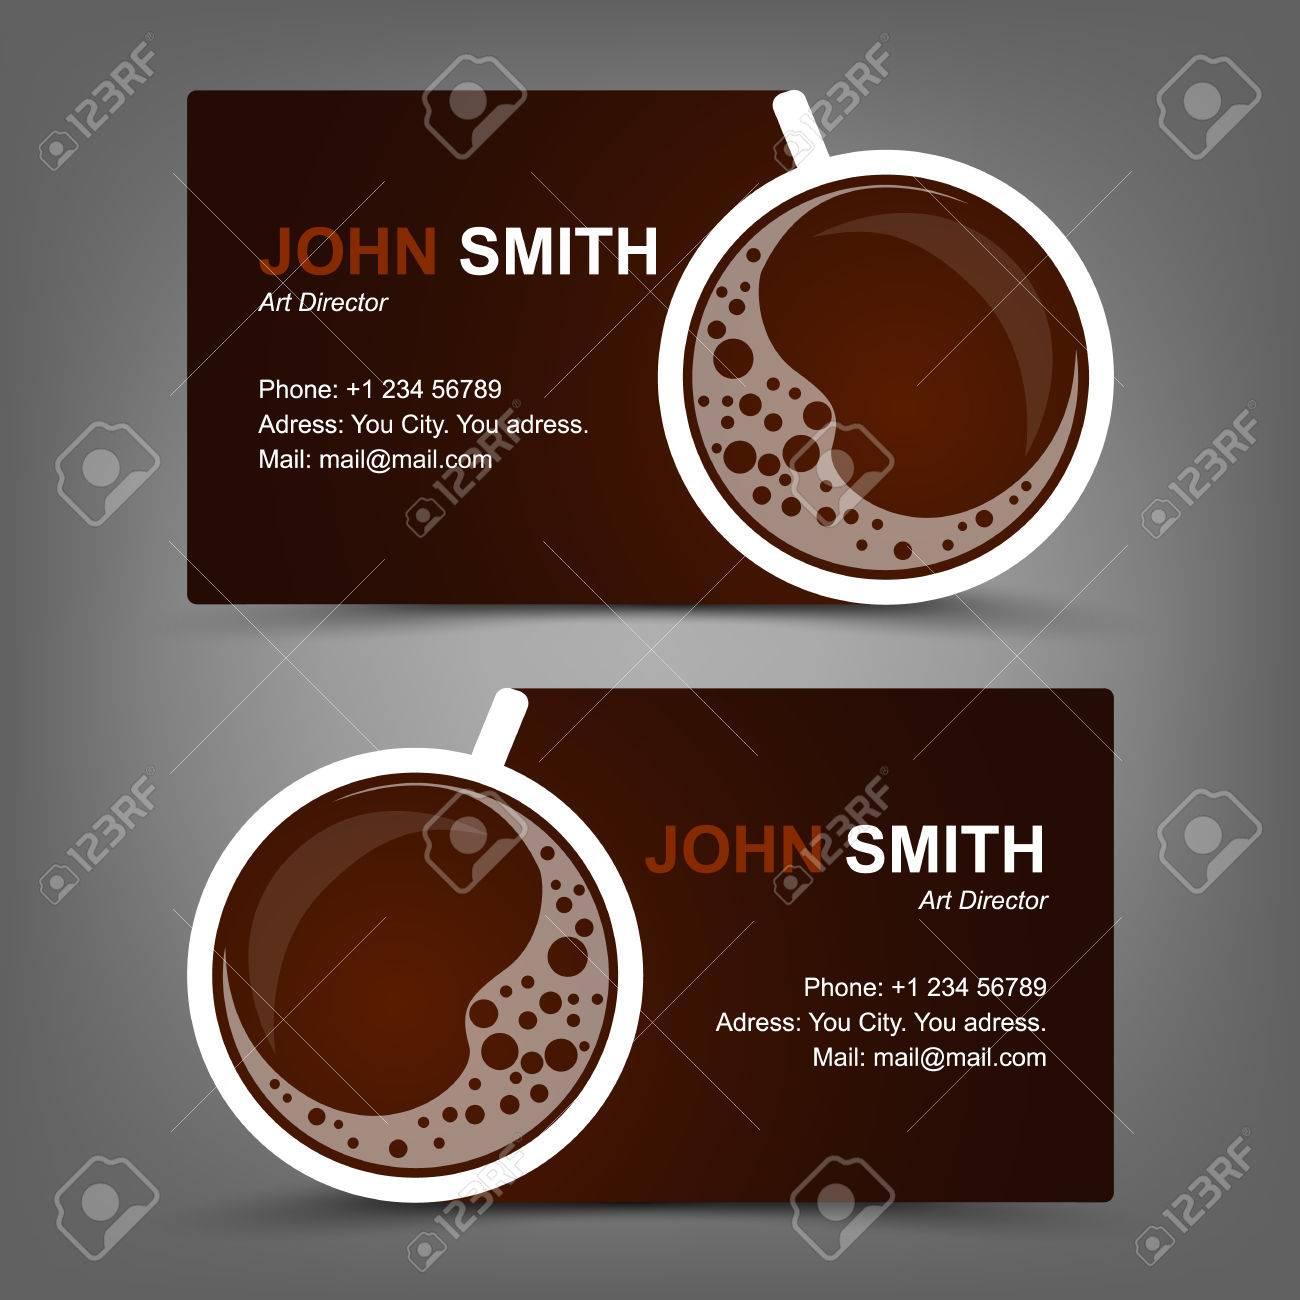 Business card coffee - 27335601